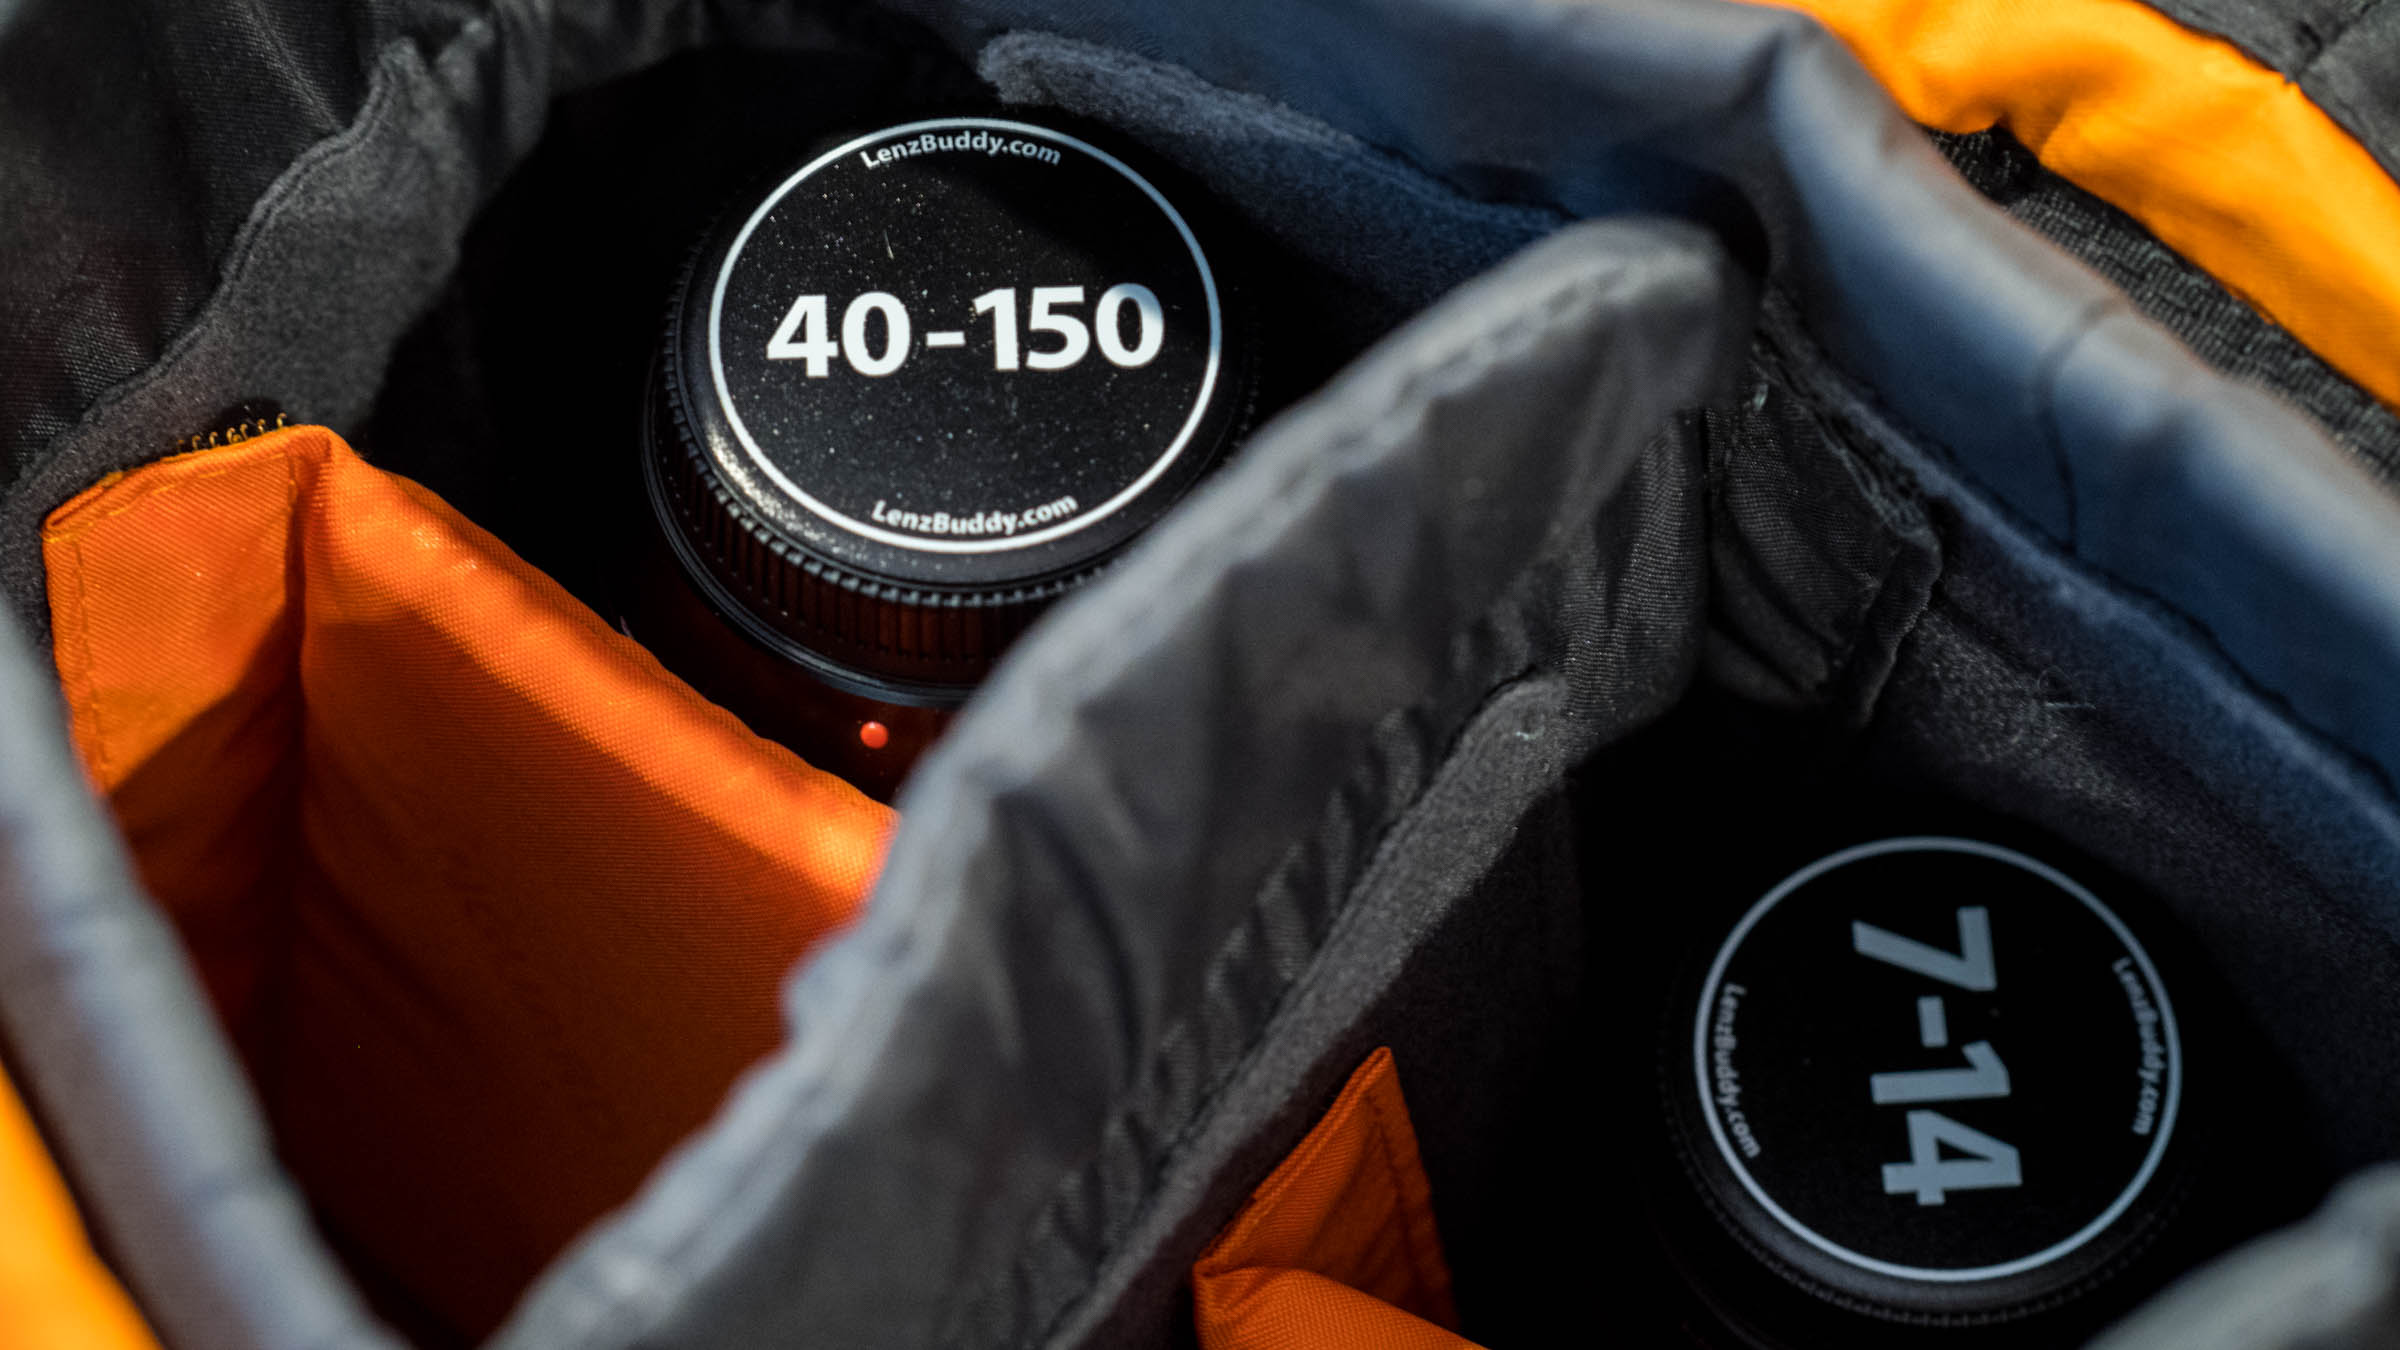 LenzBuddy Solves a Common Camera Gear Problem